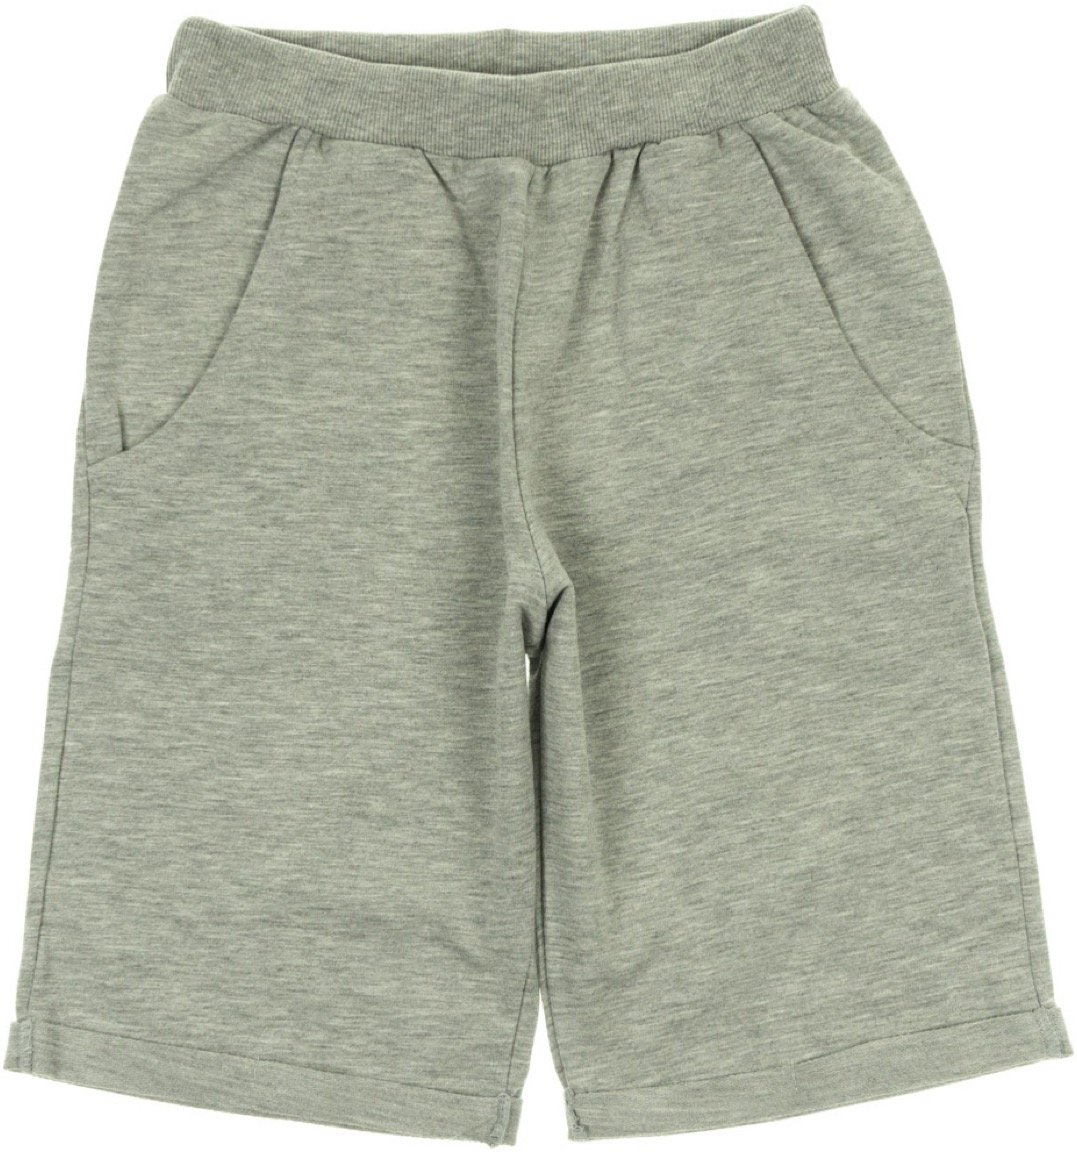 Joyce παιδικό παντελόνι βερμούδα «Simple and Grey»